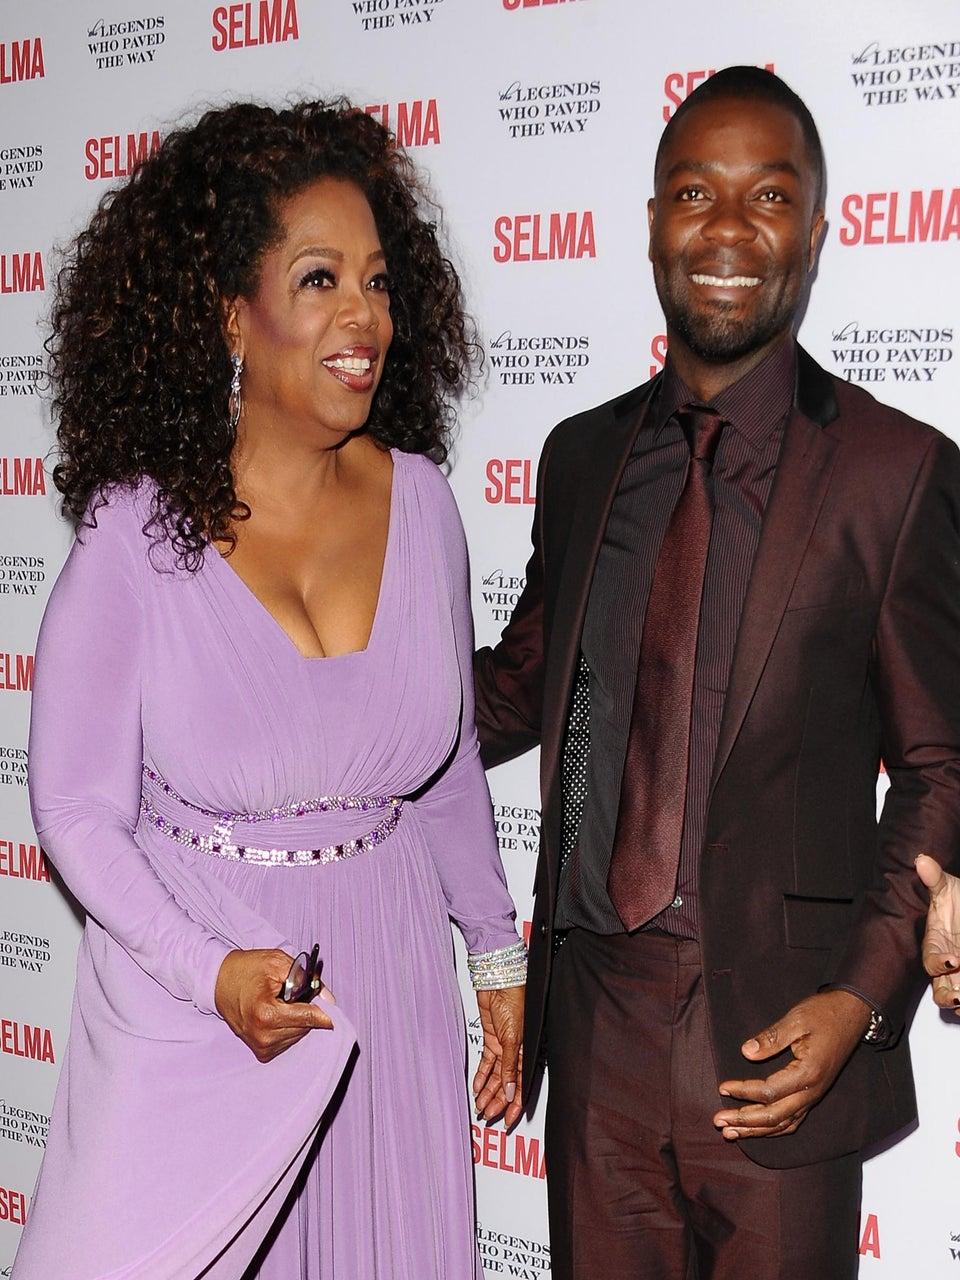 'Selma' Stars David Oyelowo, Oprah Winfrey Speak on Ferguson, Eric Brown Protests